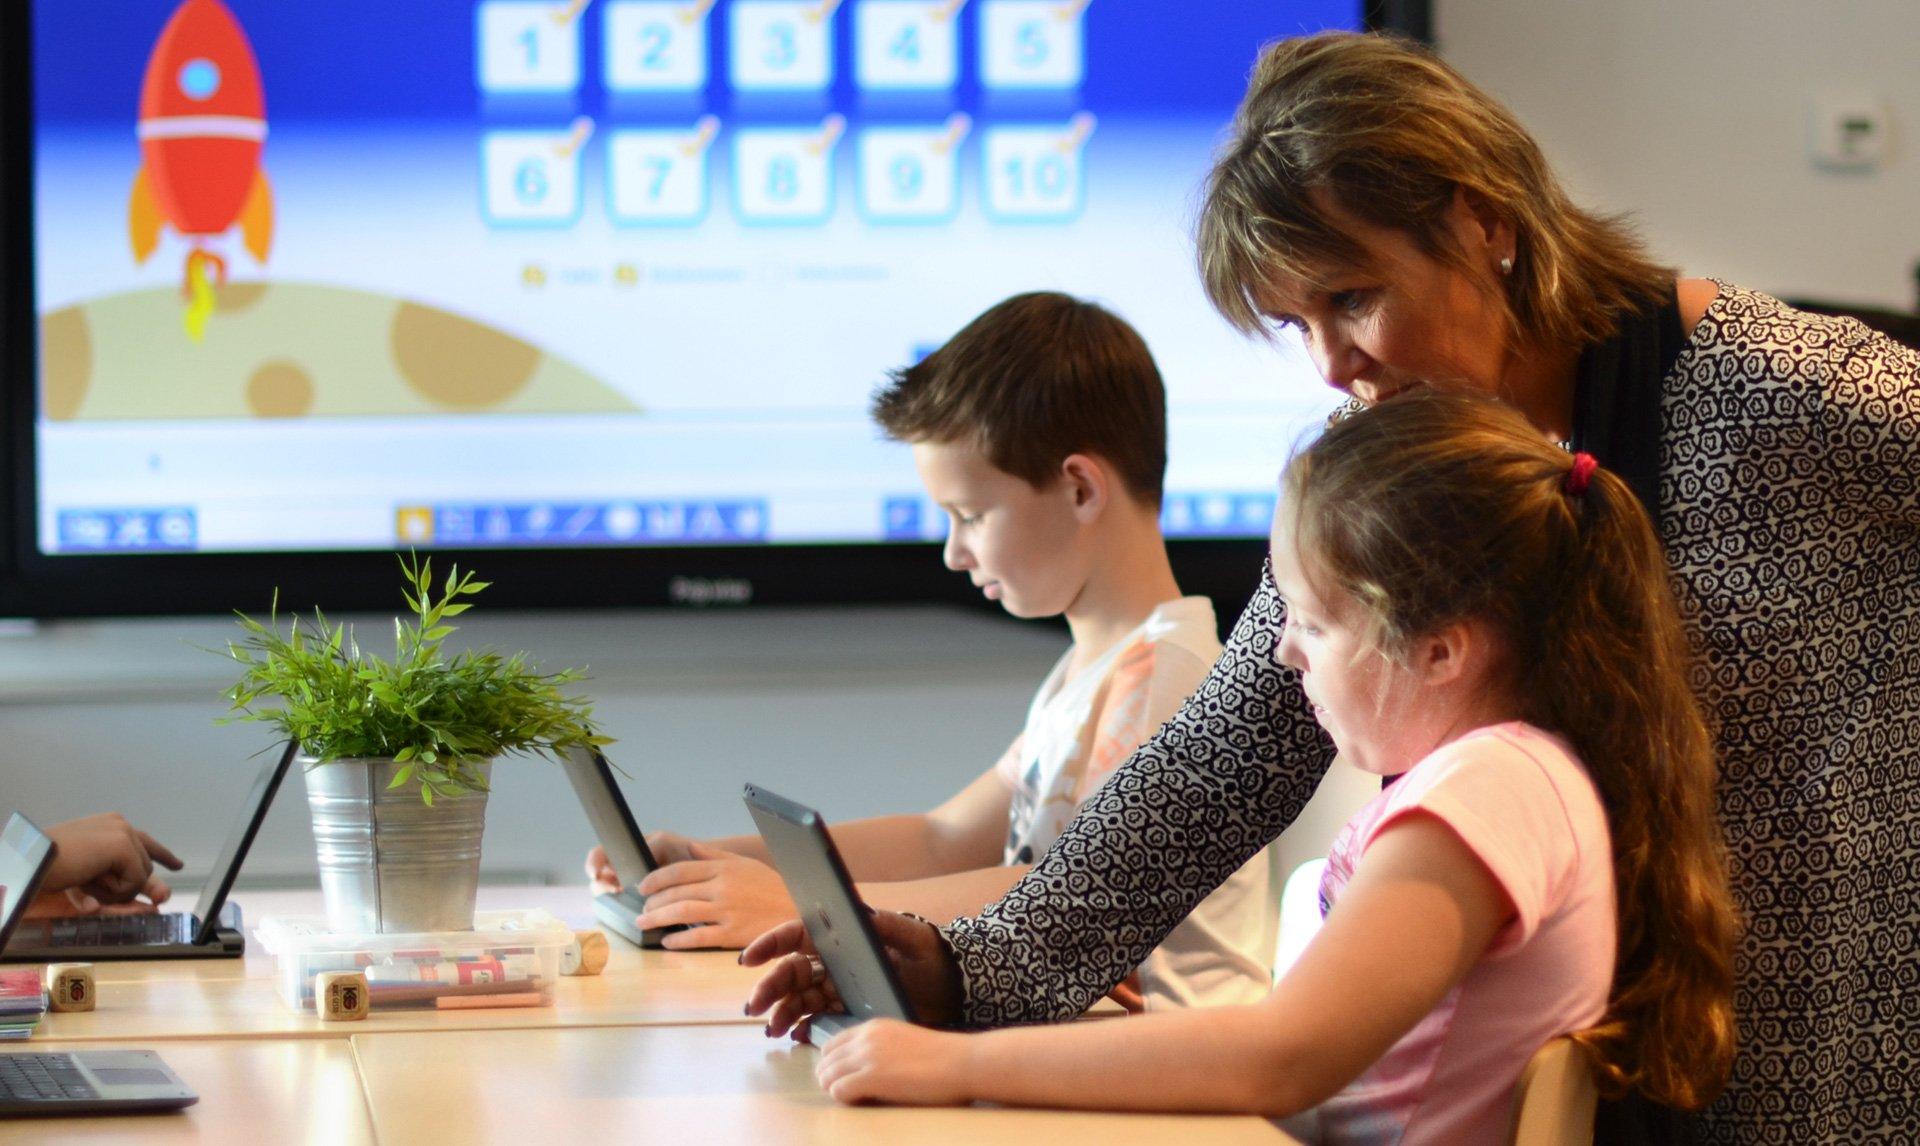 Laering Og Digitalisering I Det Moderne Klasserommet